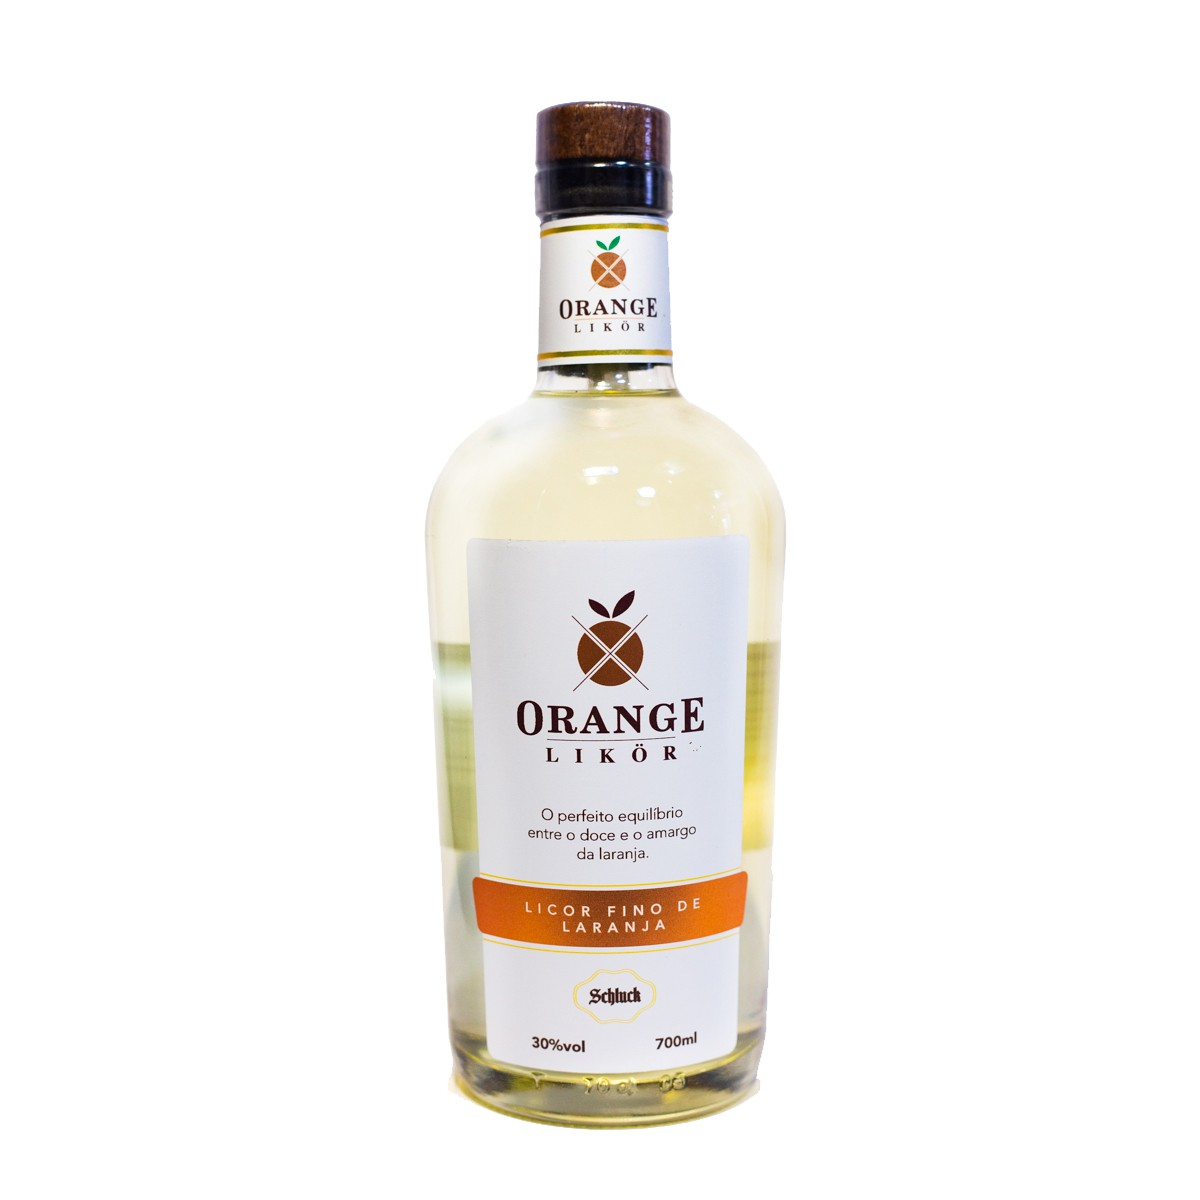 Licor Fino de Laranja - Orange Likor - Schluck - 700 ml